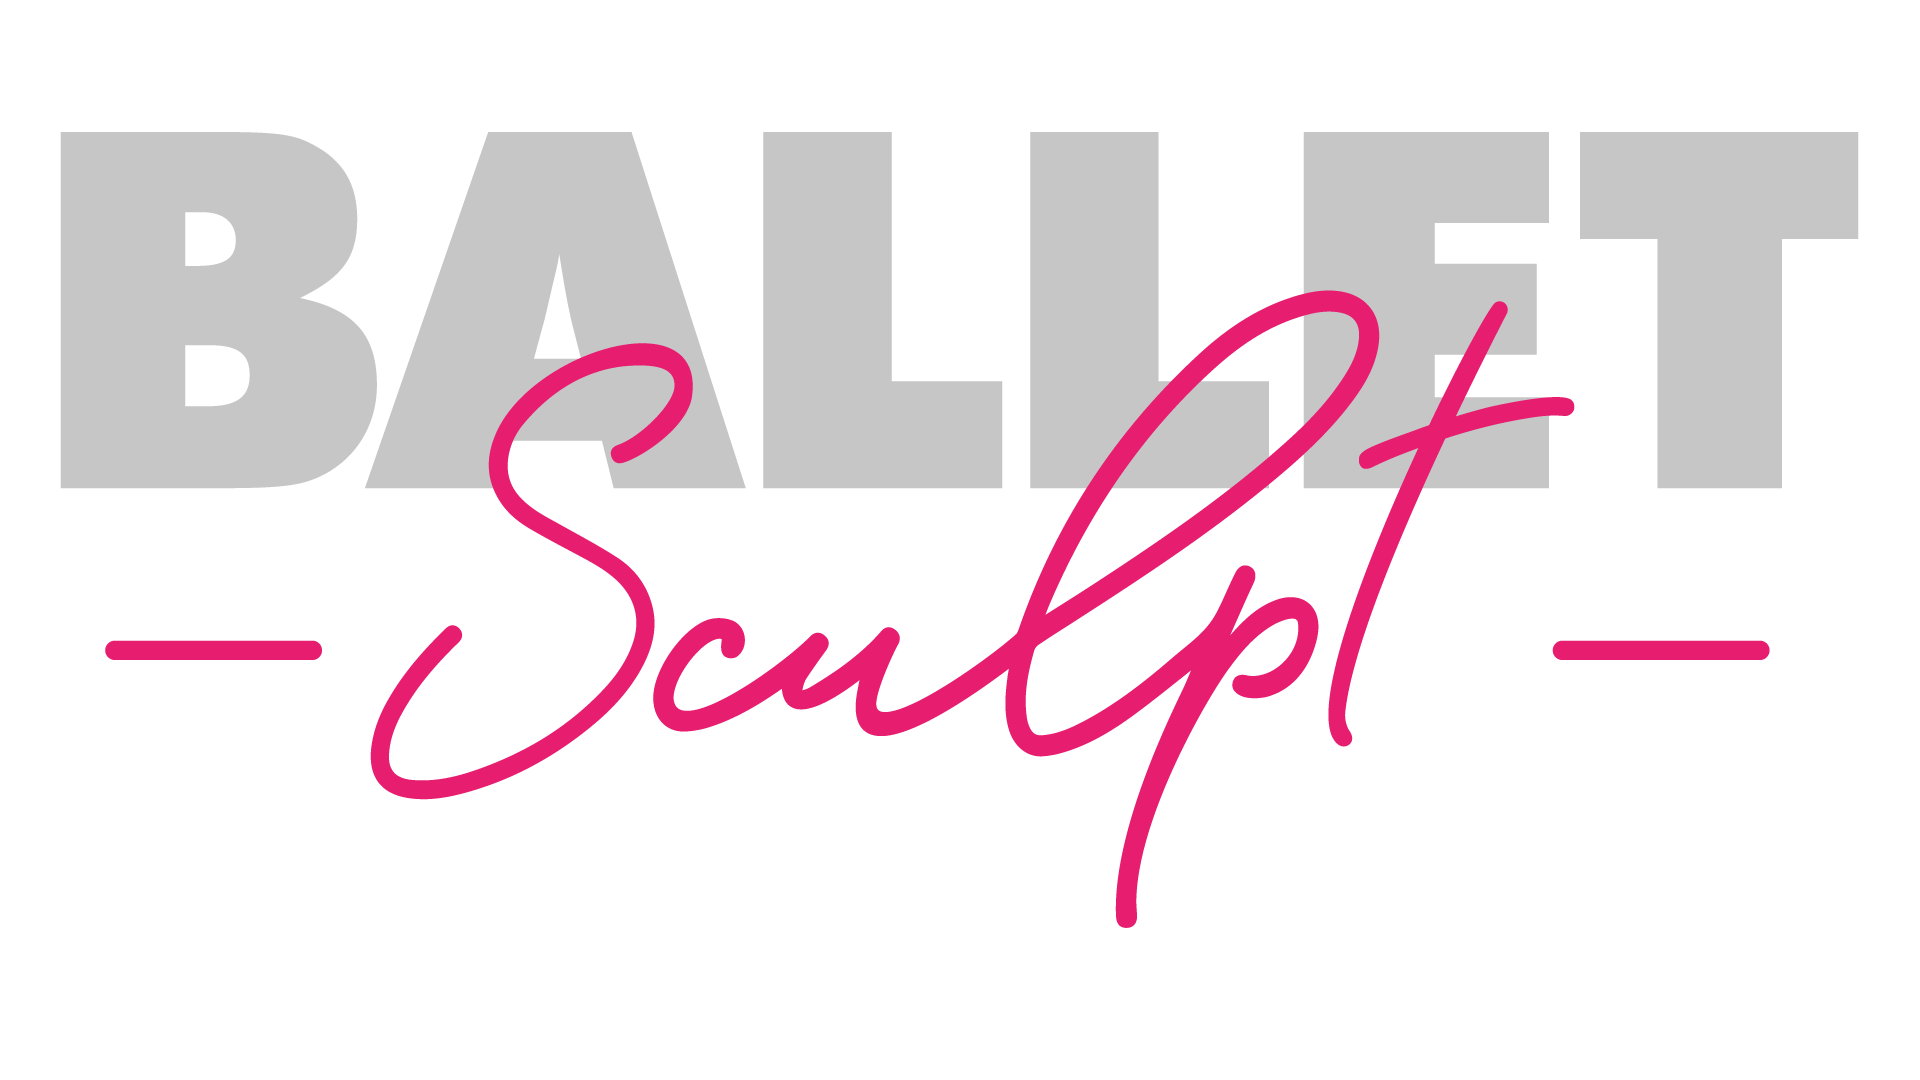 Ballet Sculpt